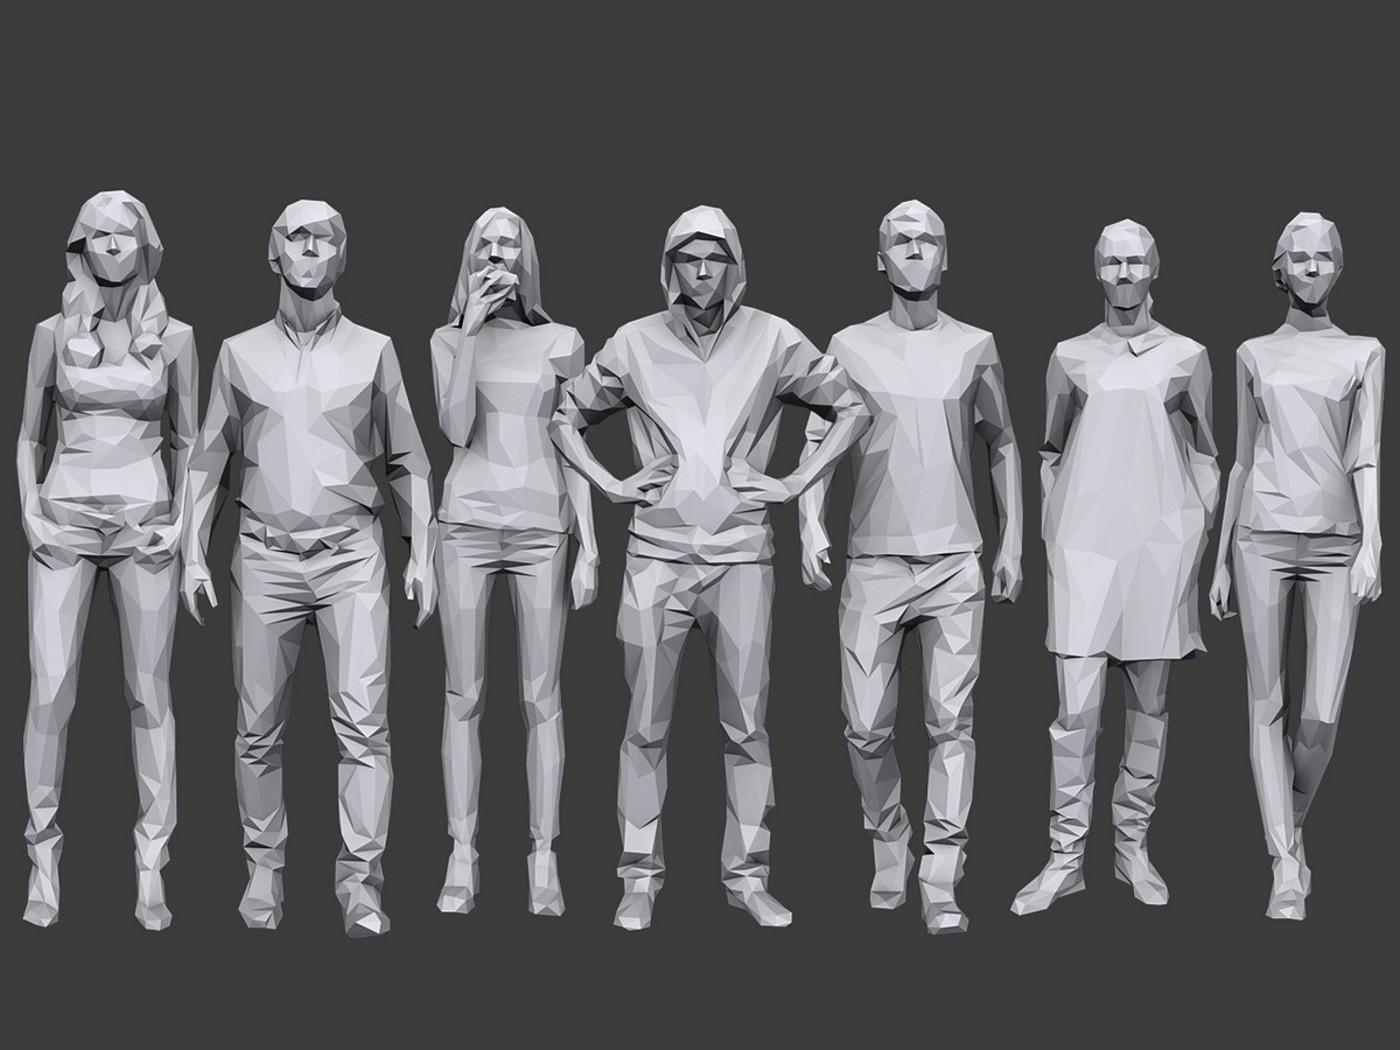 100+低多边形人物3D模型 Cubebrush – Complete Lowpoly People Pack Volume 2